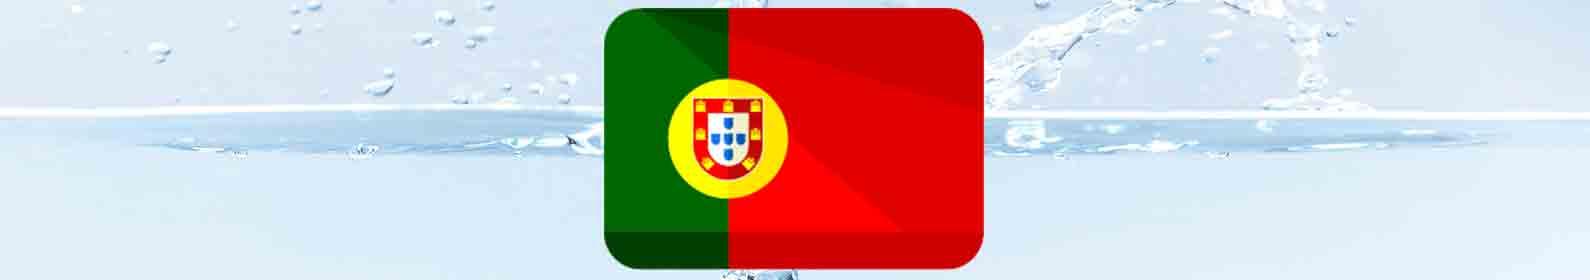 water-treatment-portugal.jpg